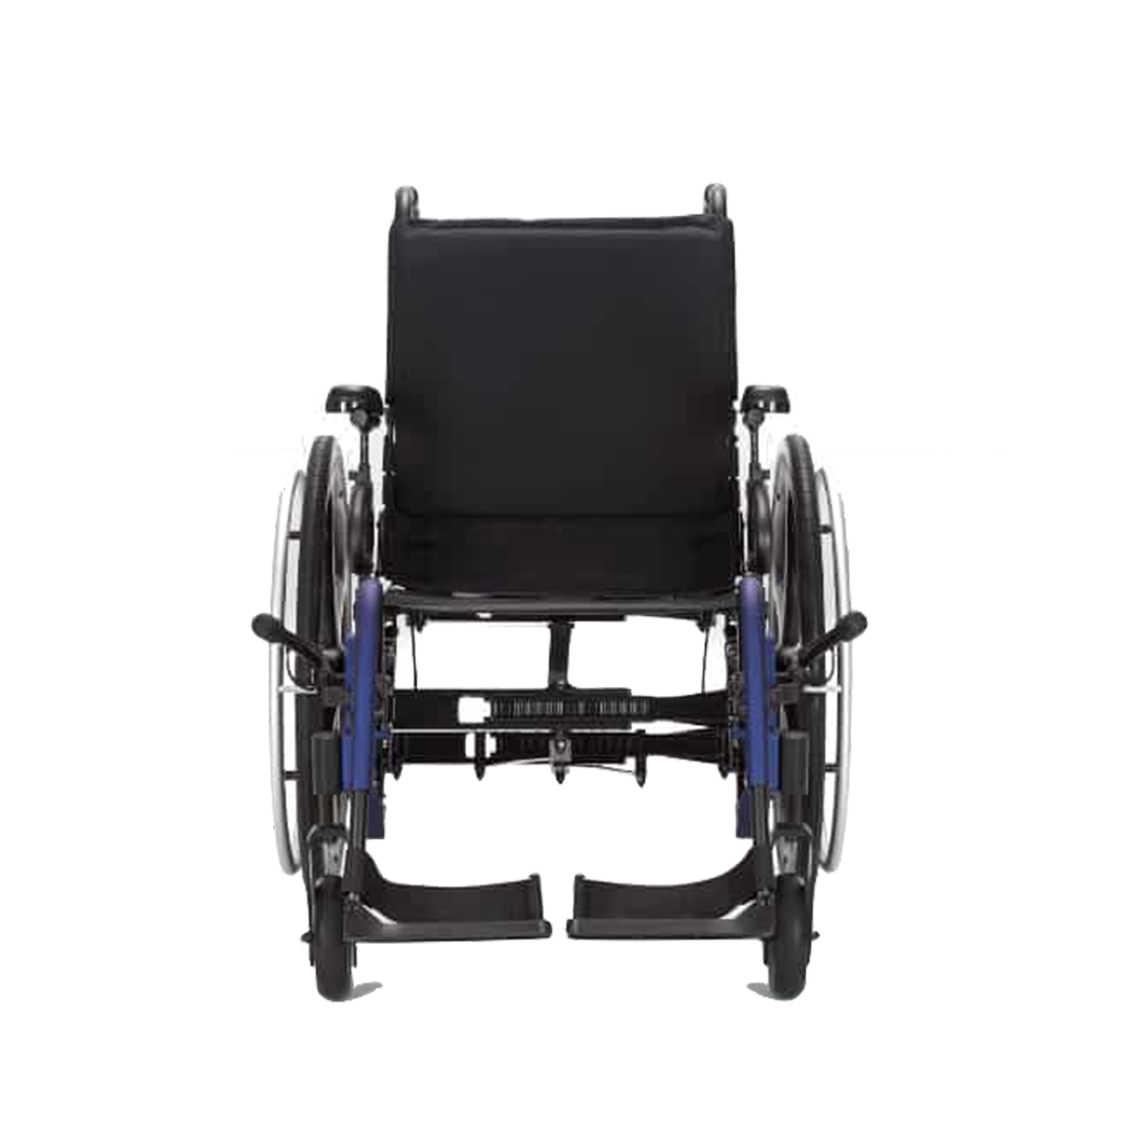 Ki mobility Liberty FT - Quickship